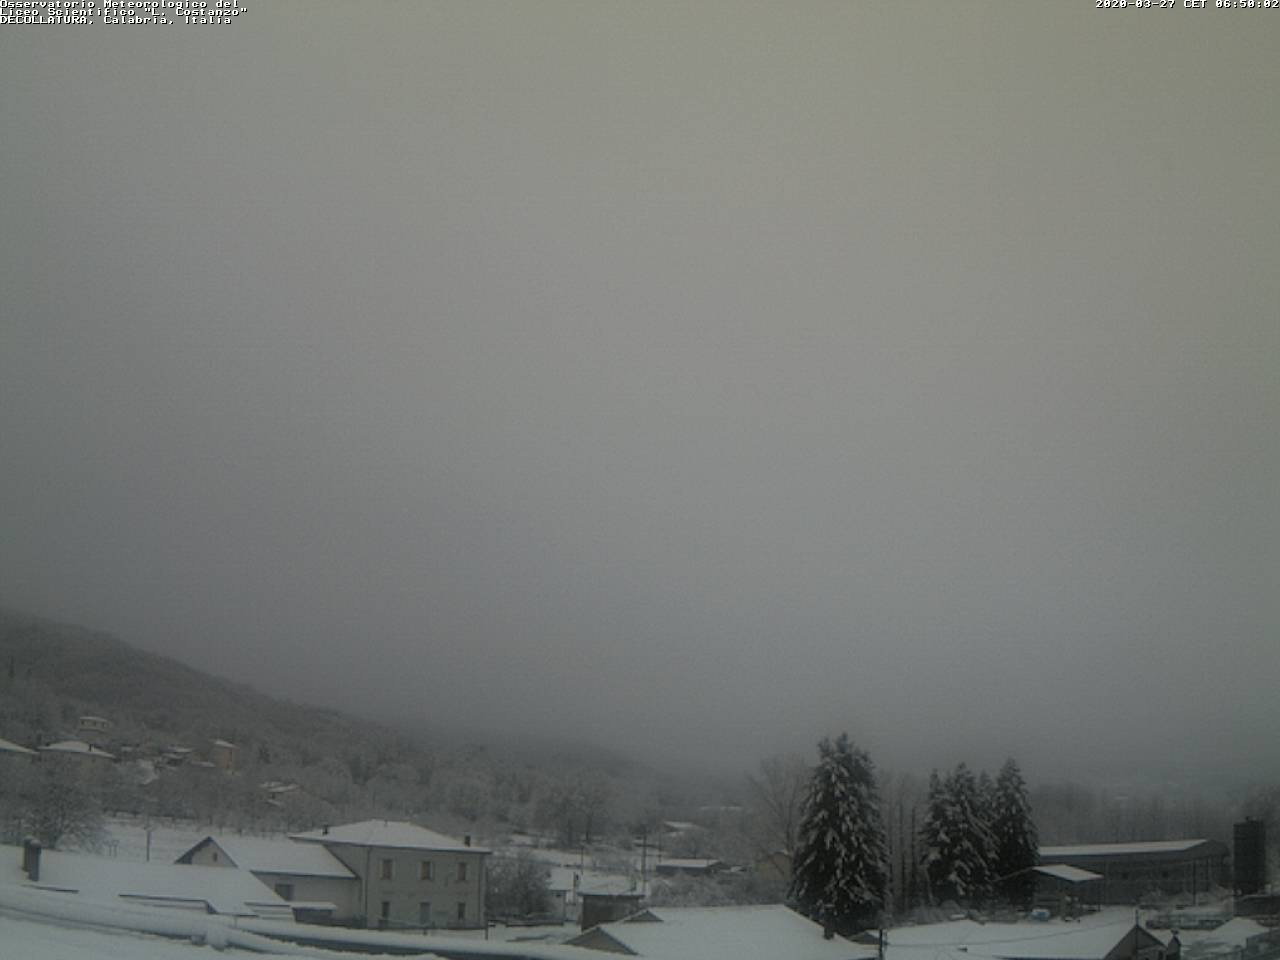 neve Decollatura 27 marzo 2020